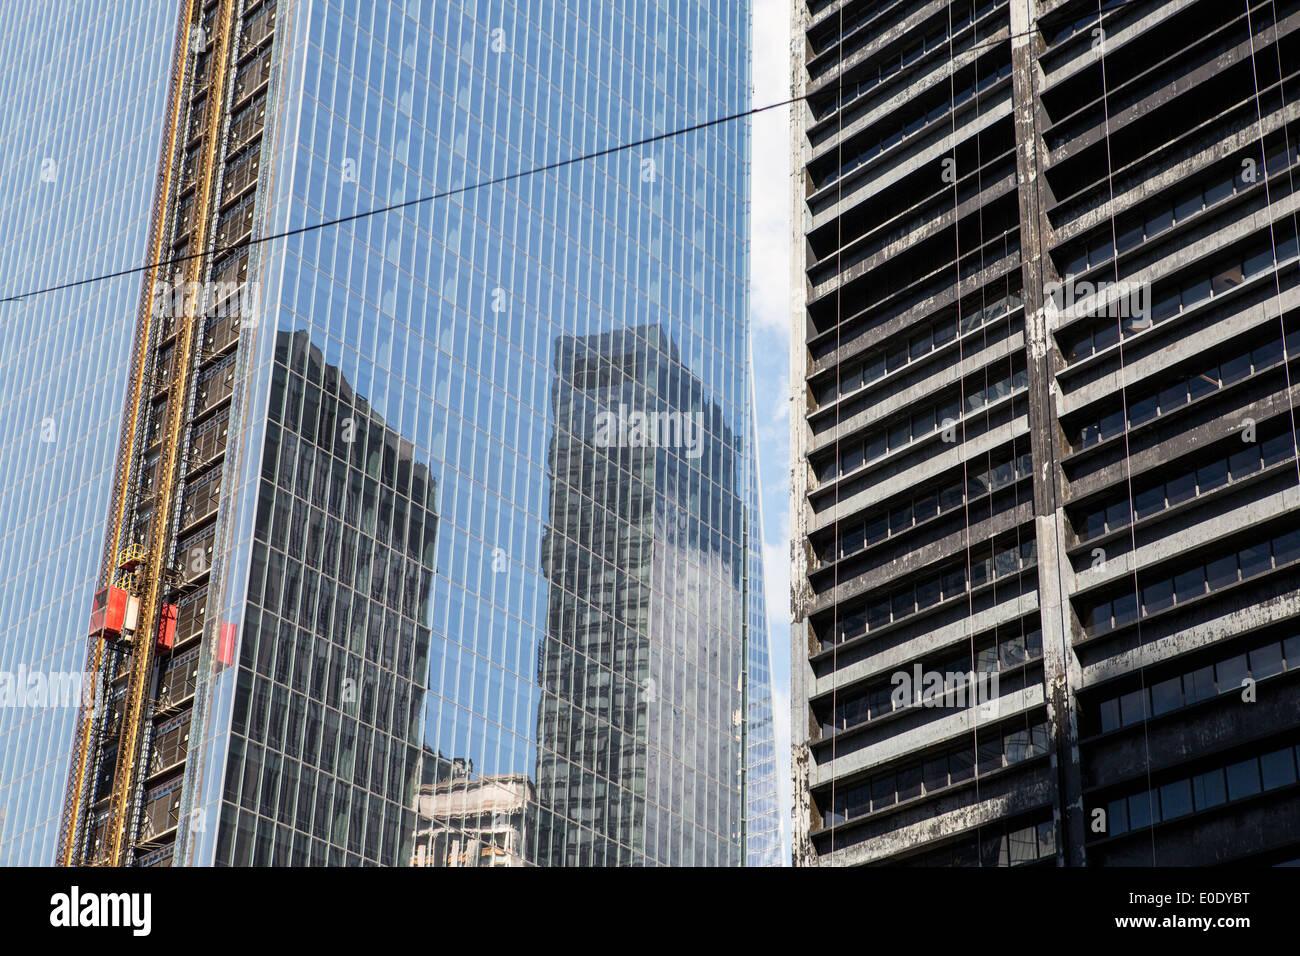 Reconstructioin of the World Trade center building, New York - Stock Image